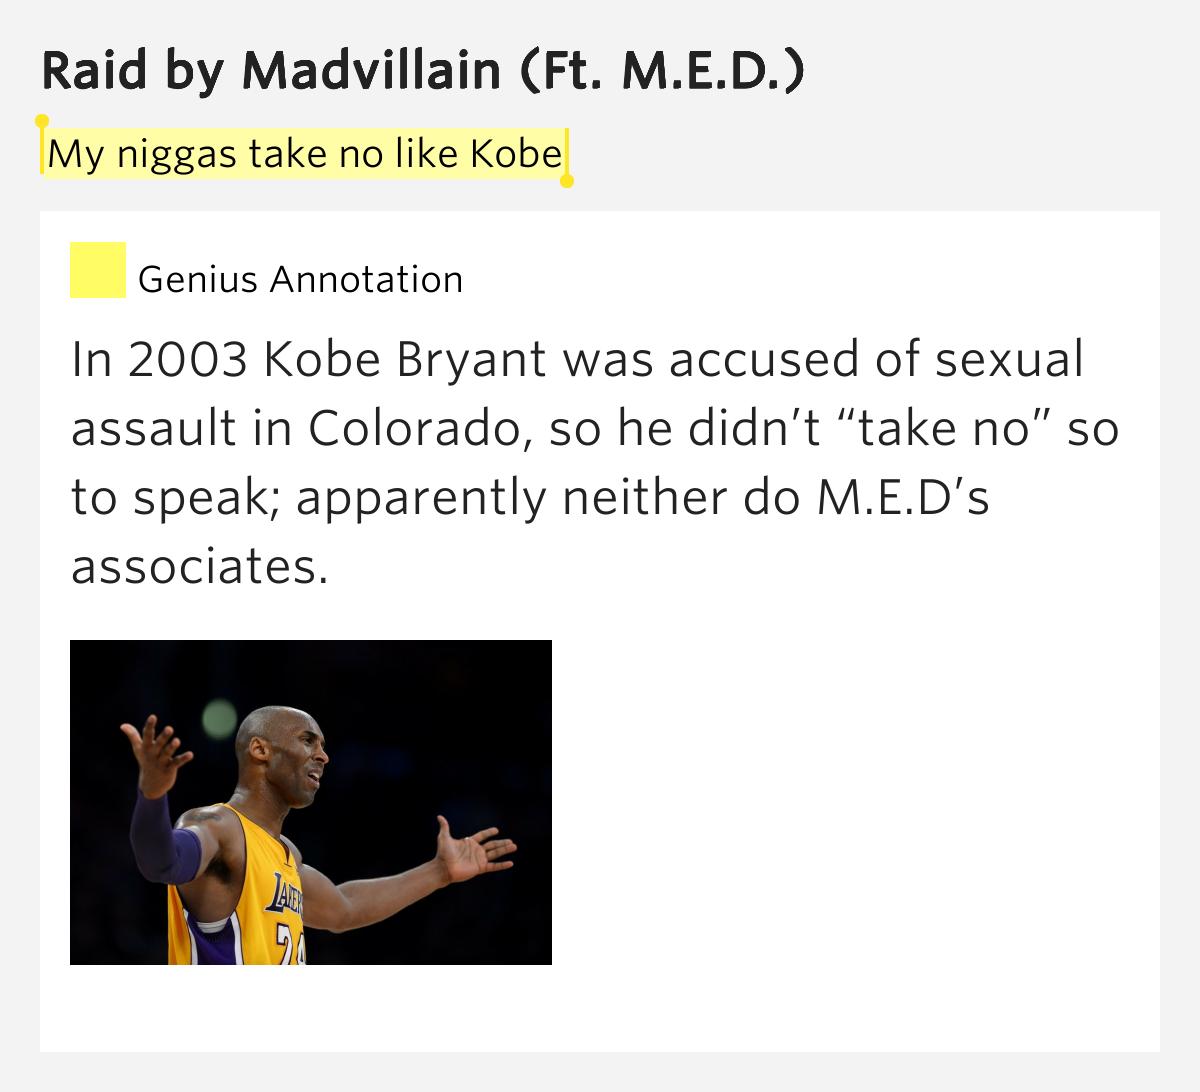 Kobe bryant assalt sexuelle